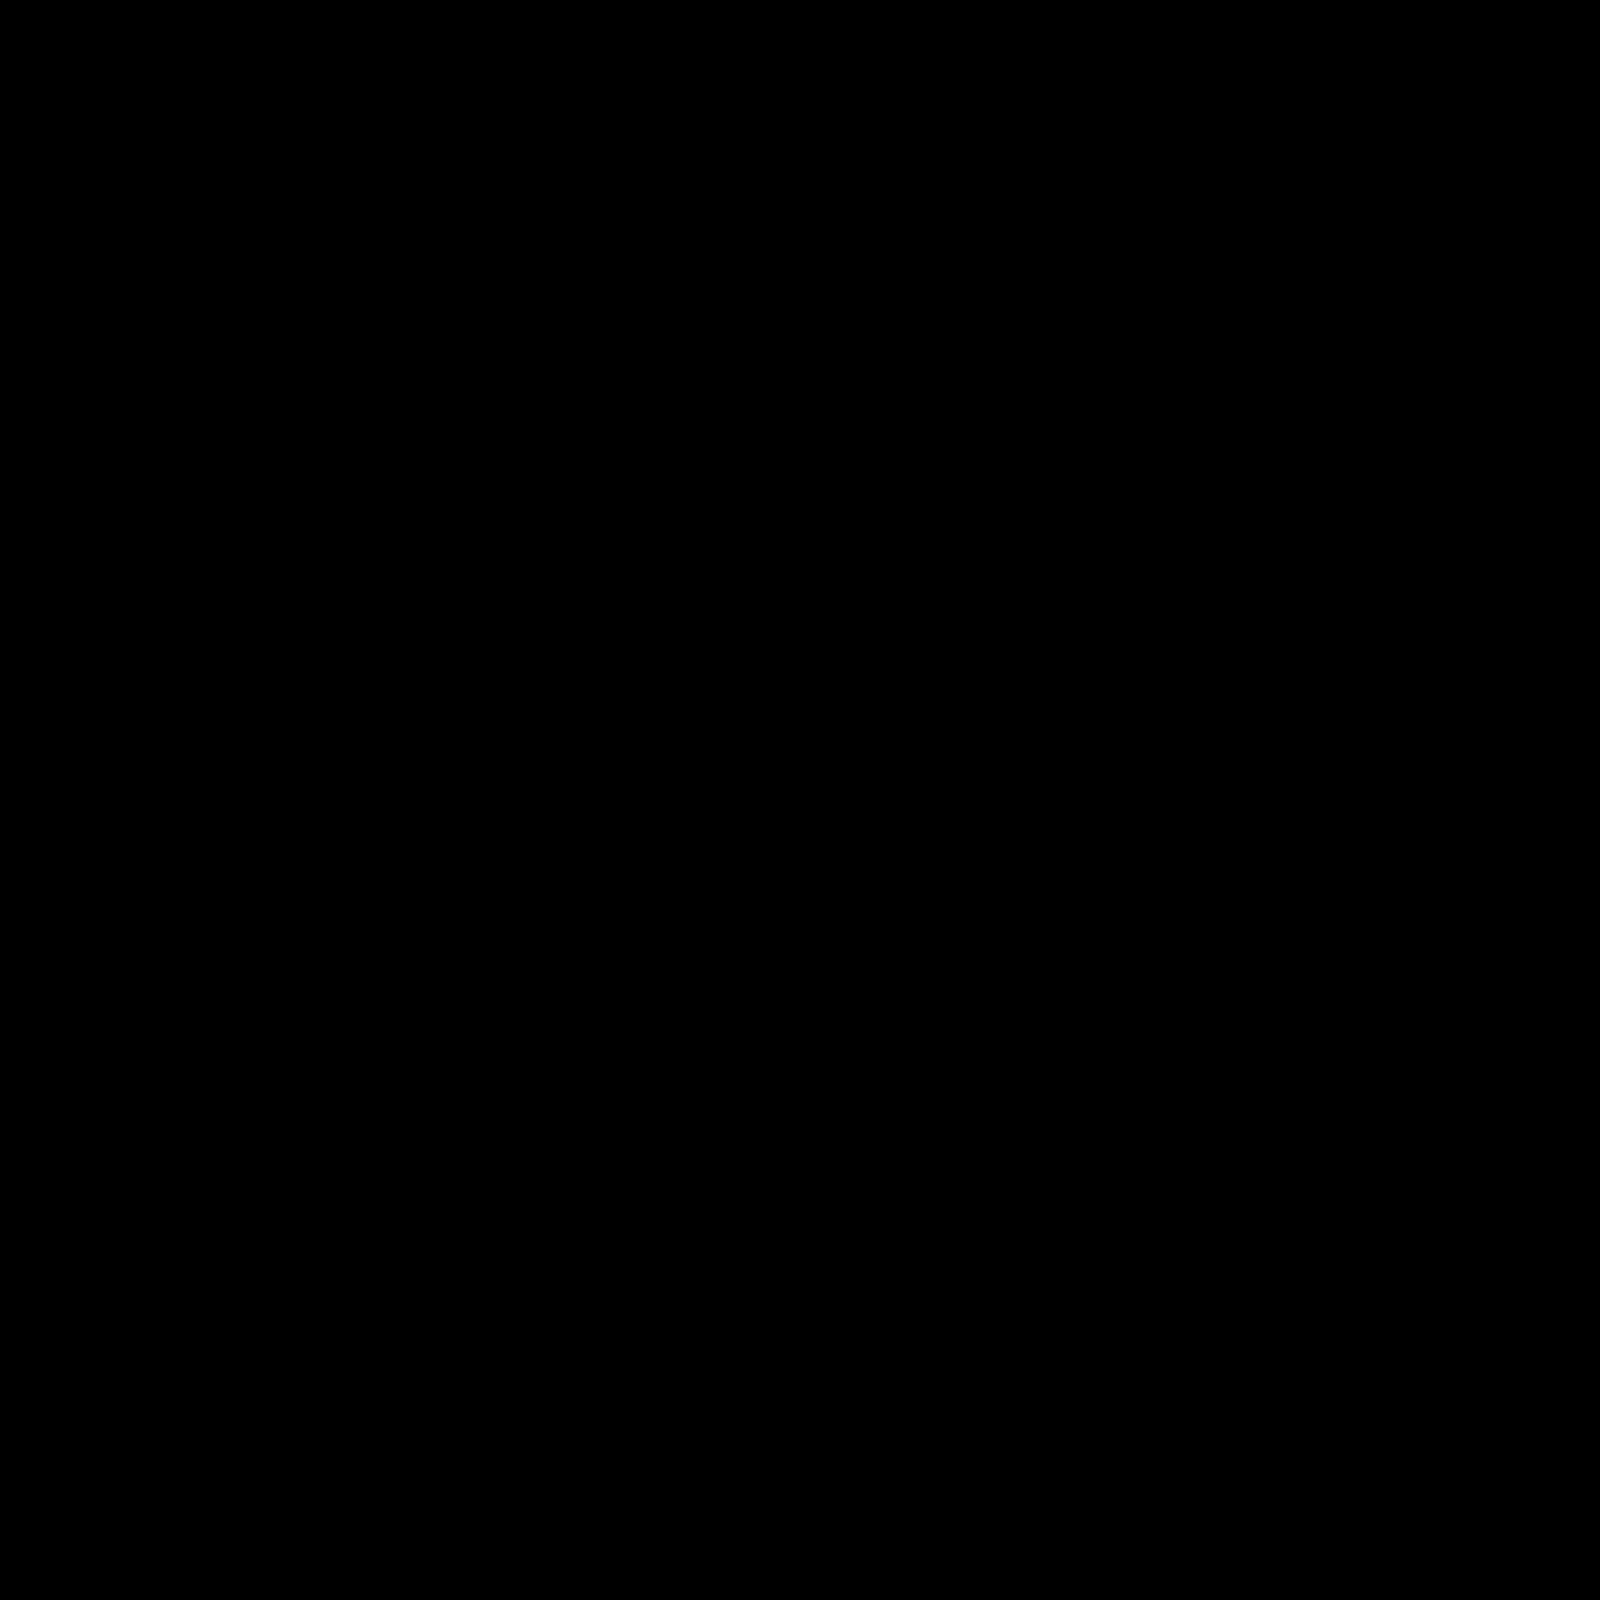 Images of outline logo. Clipart diamond symbol